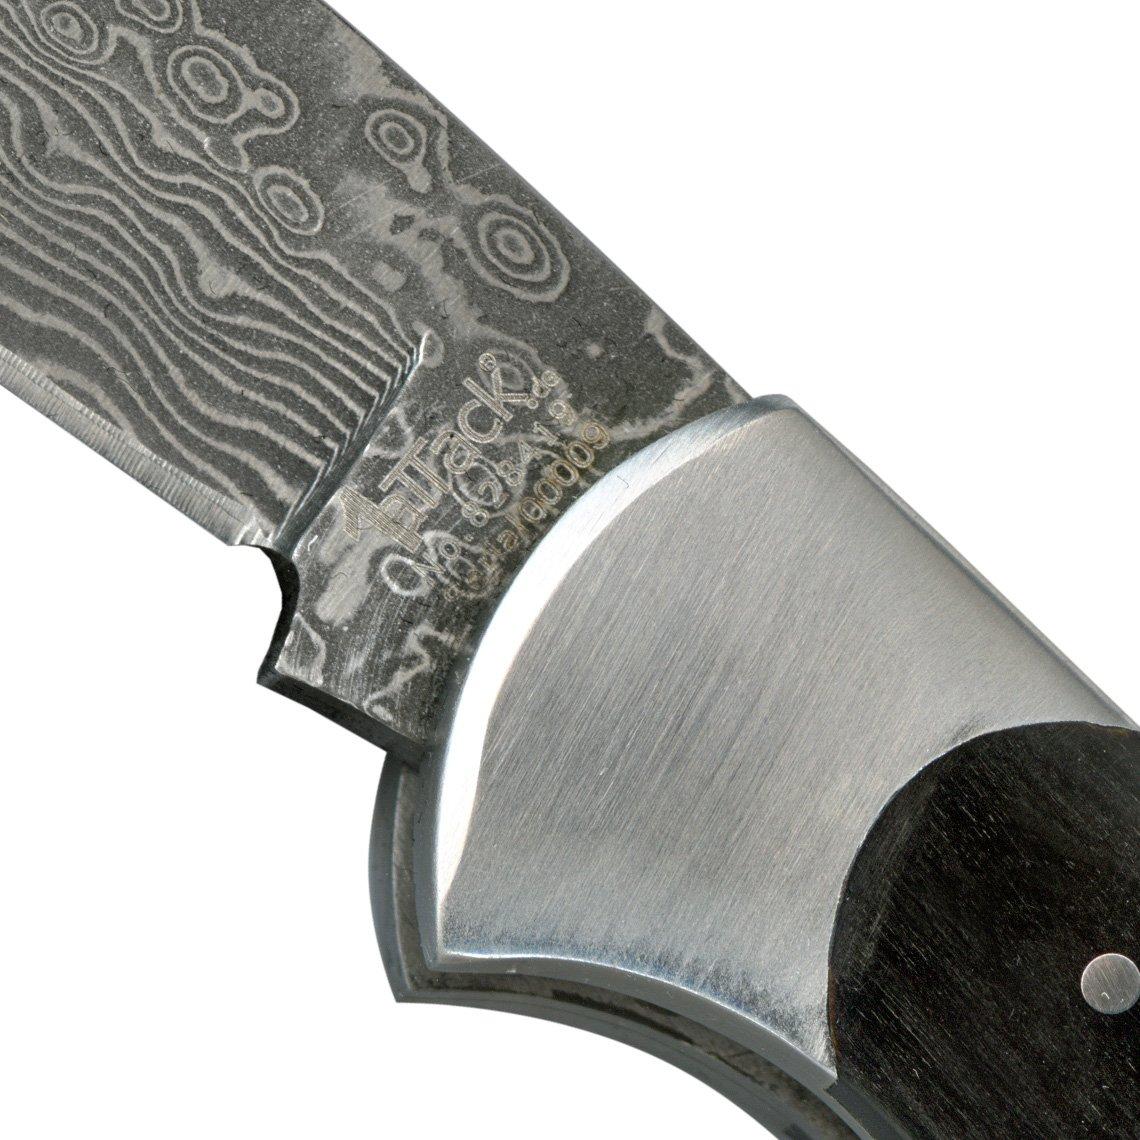 Cuchillo de caza en acero de damasco de la mejor calidad, de bolsillo, para actividades de exterior, para la cocina, regalo perfecto para ...